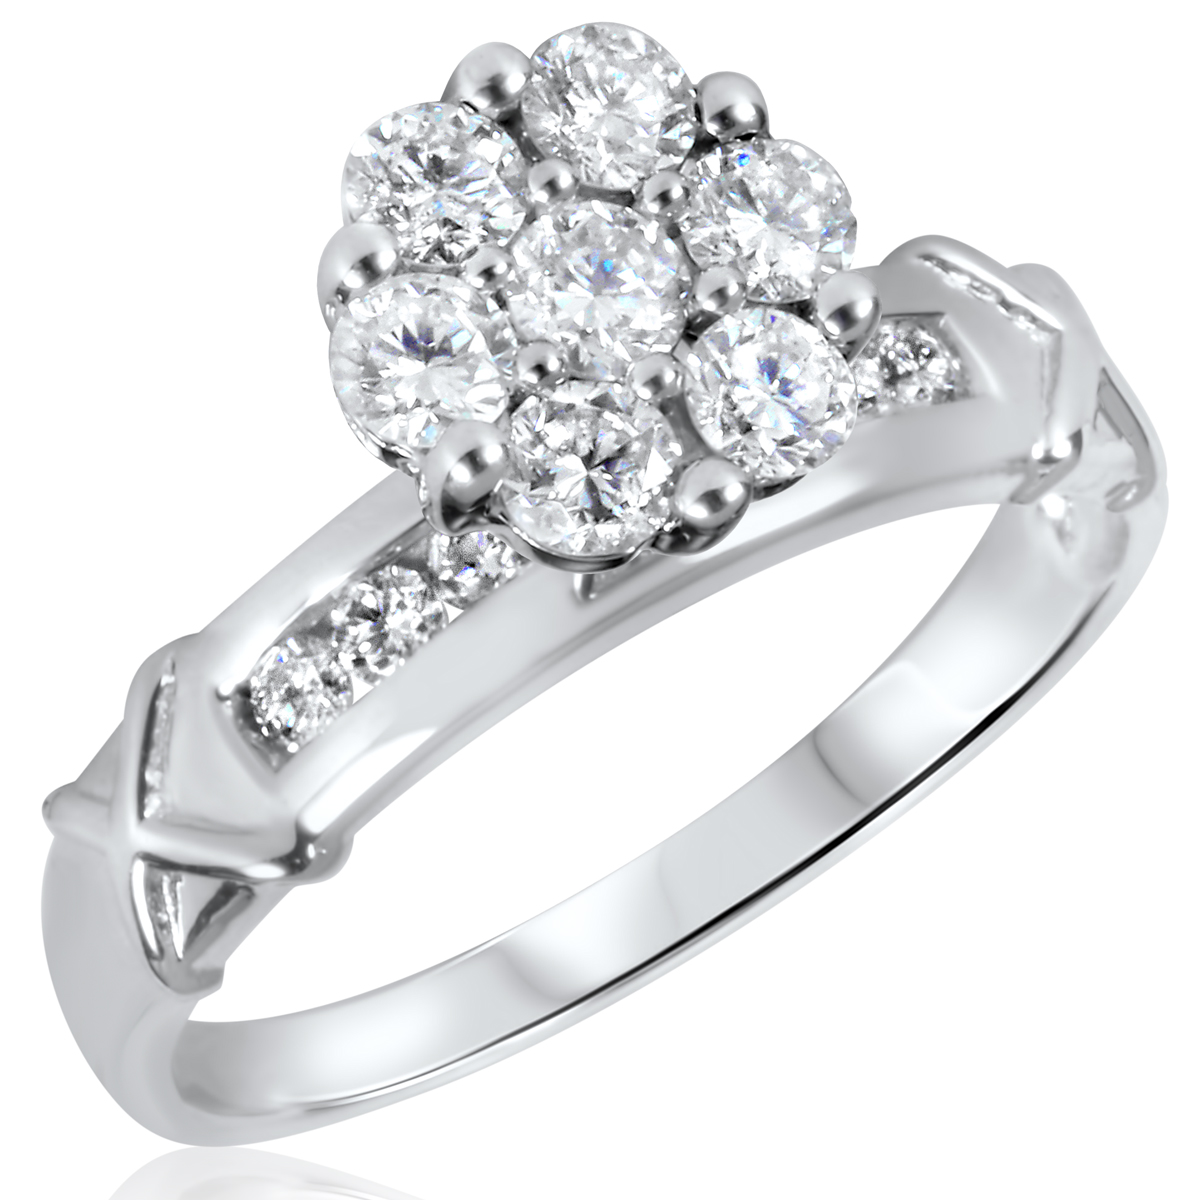 3/4 CT. T.W. Diamond Ladies Engagement Ring 10K White Gold- Size 8